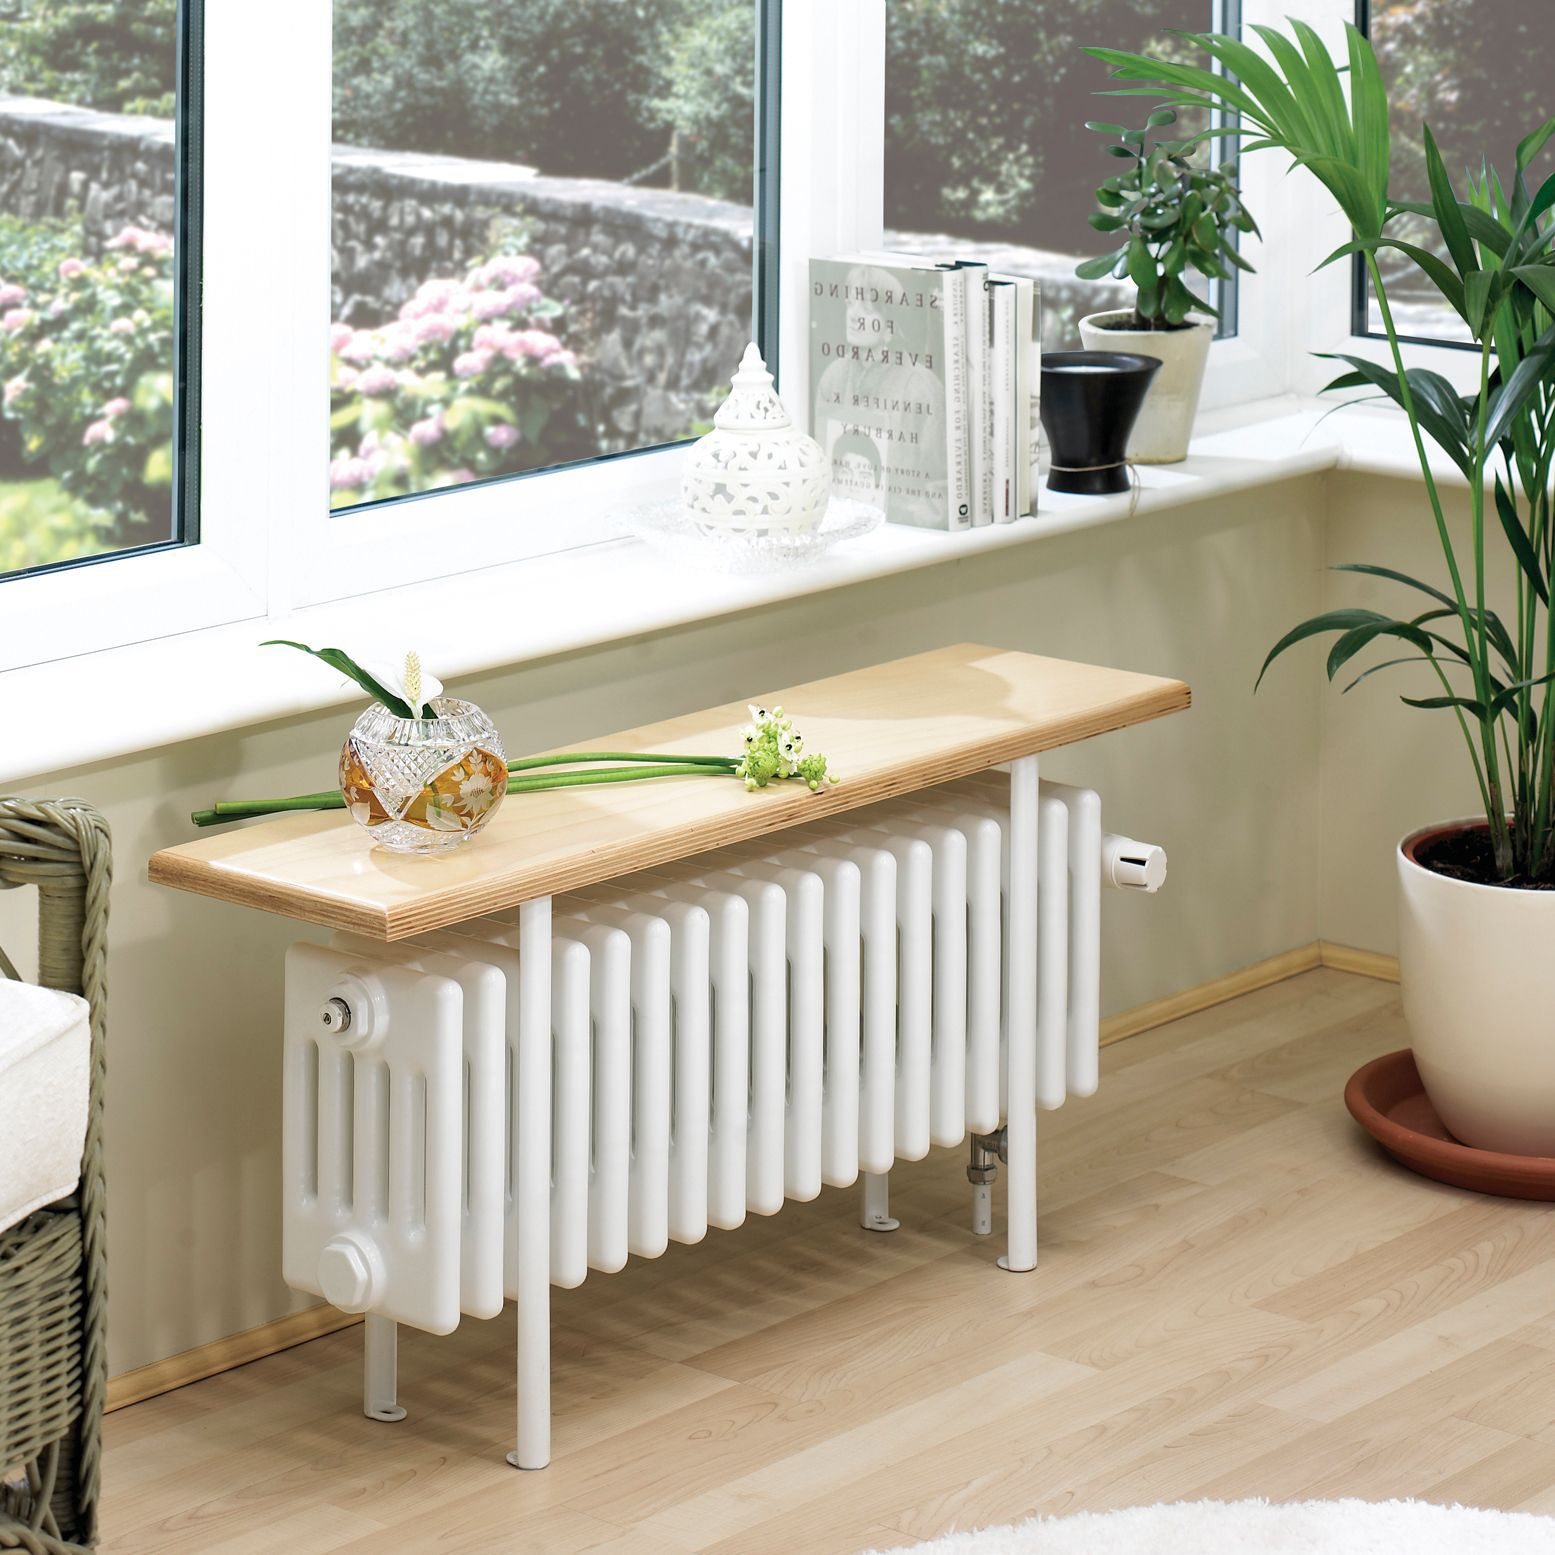 Acova 4 Column radiator, White (W)1000mm (H)455mm